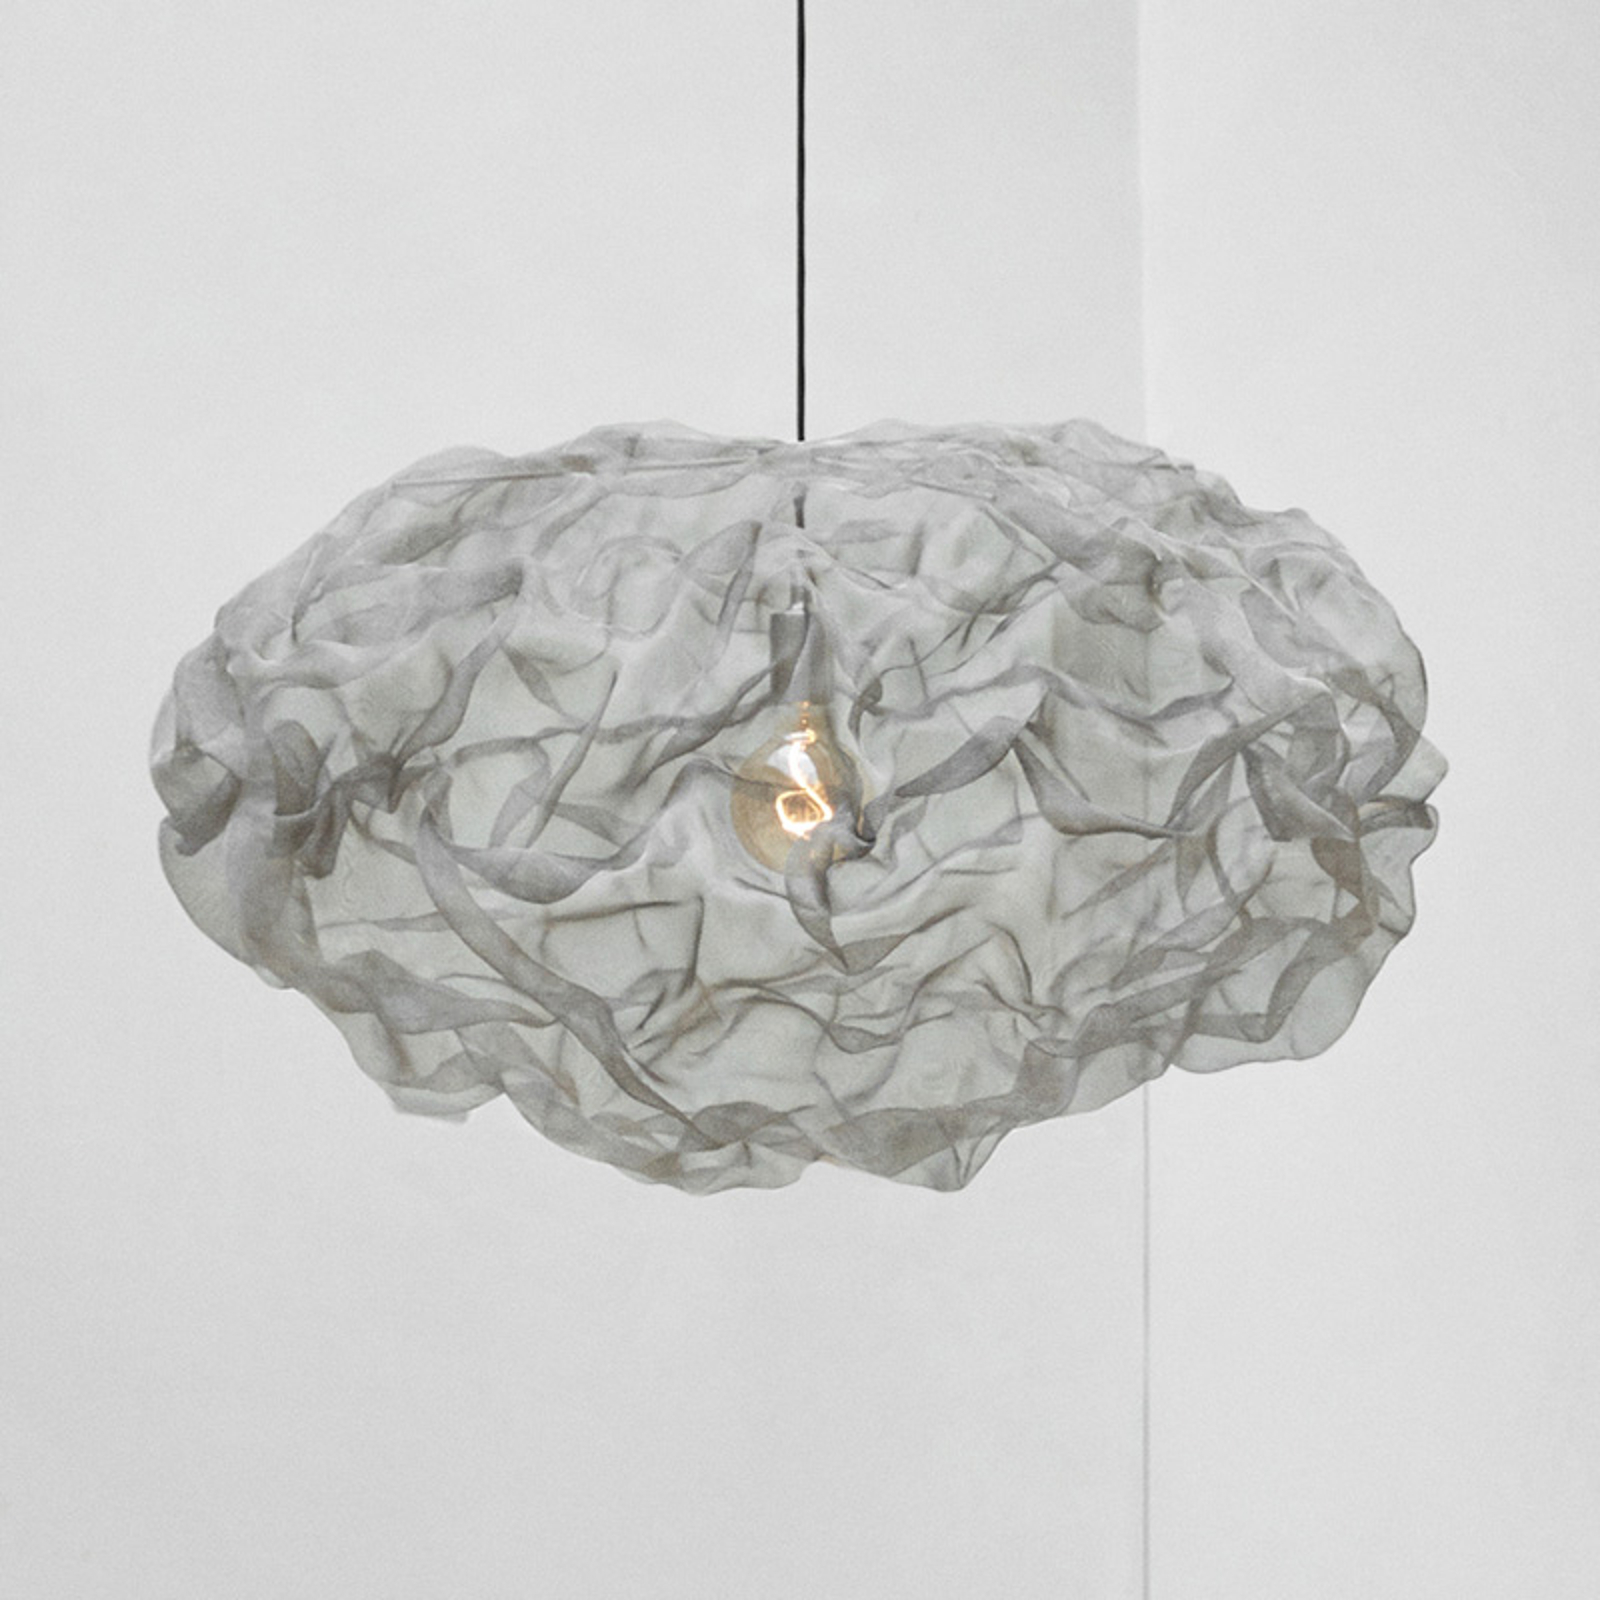 Northern Heat hanglamp, staal, Ø 80cm